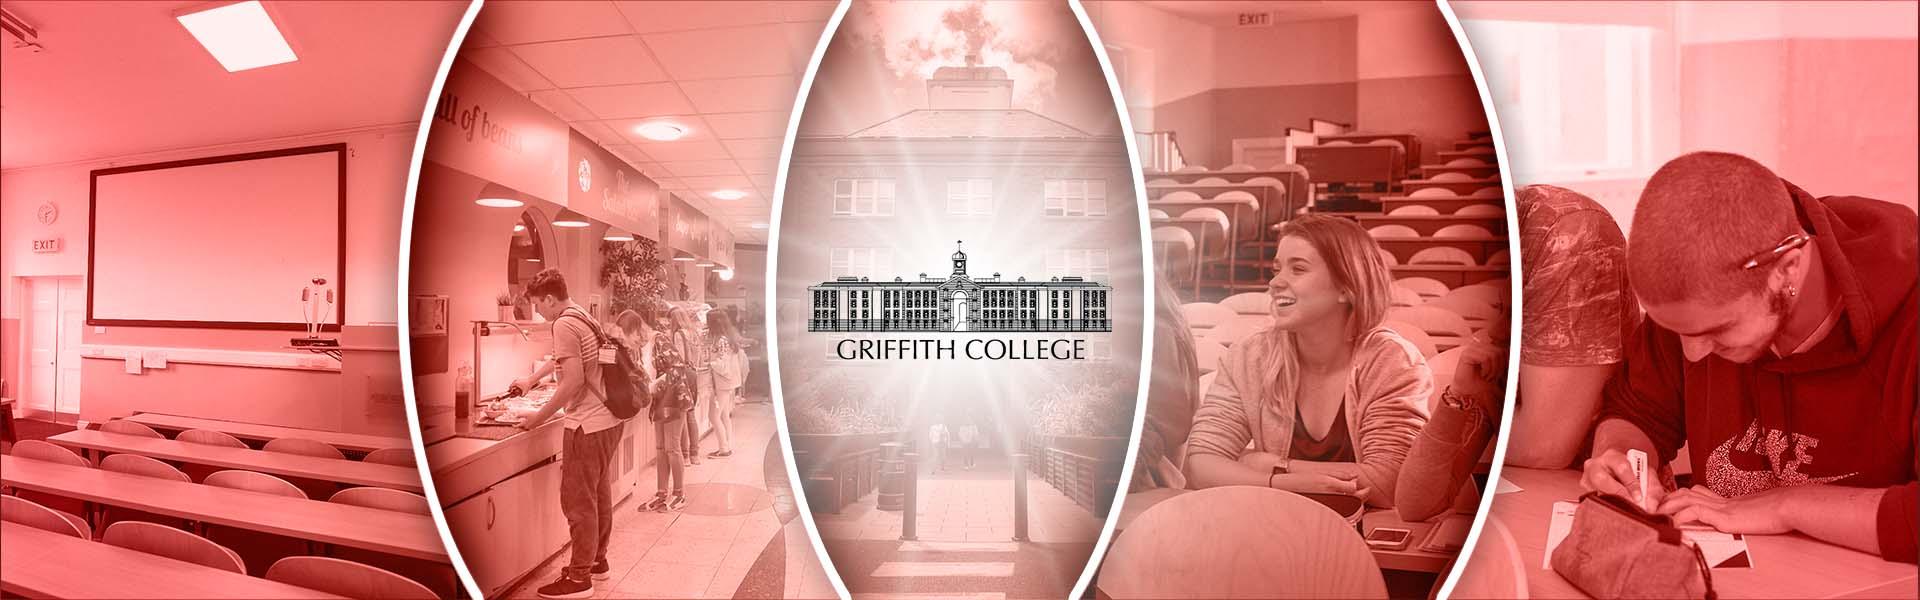 Griffith College Dublin Dil Okulu